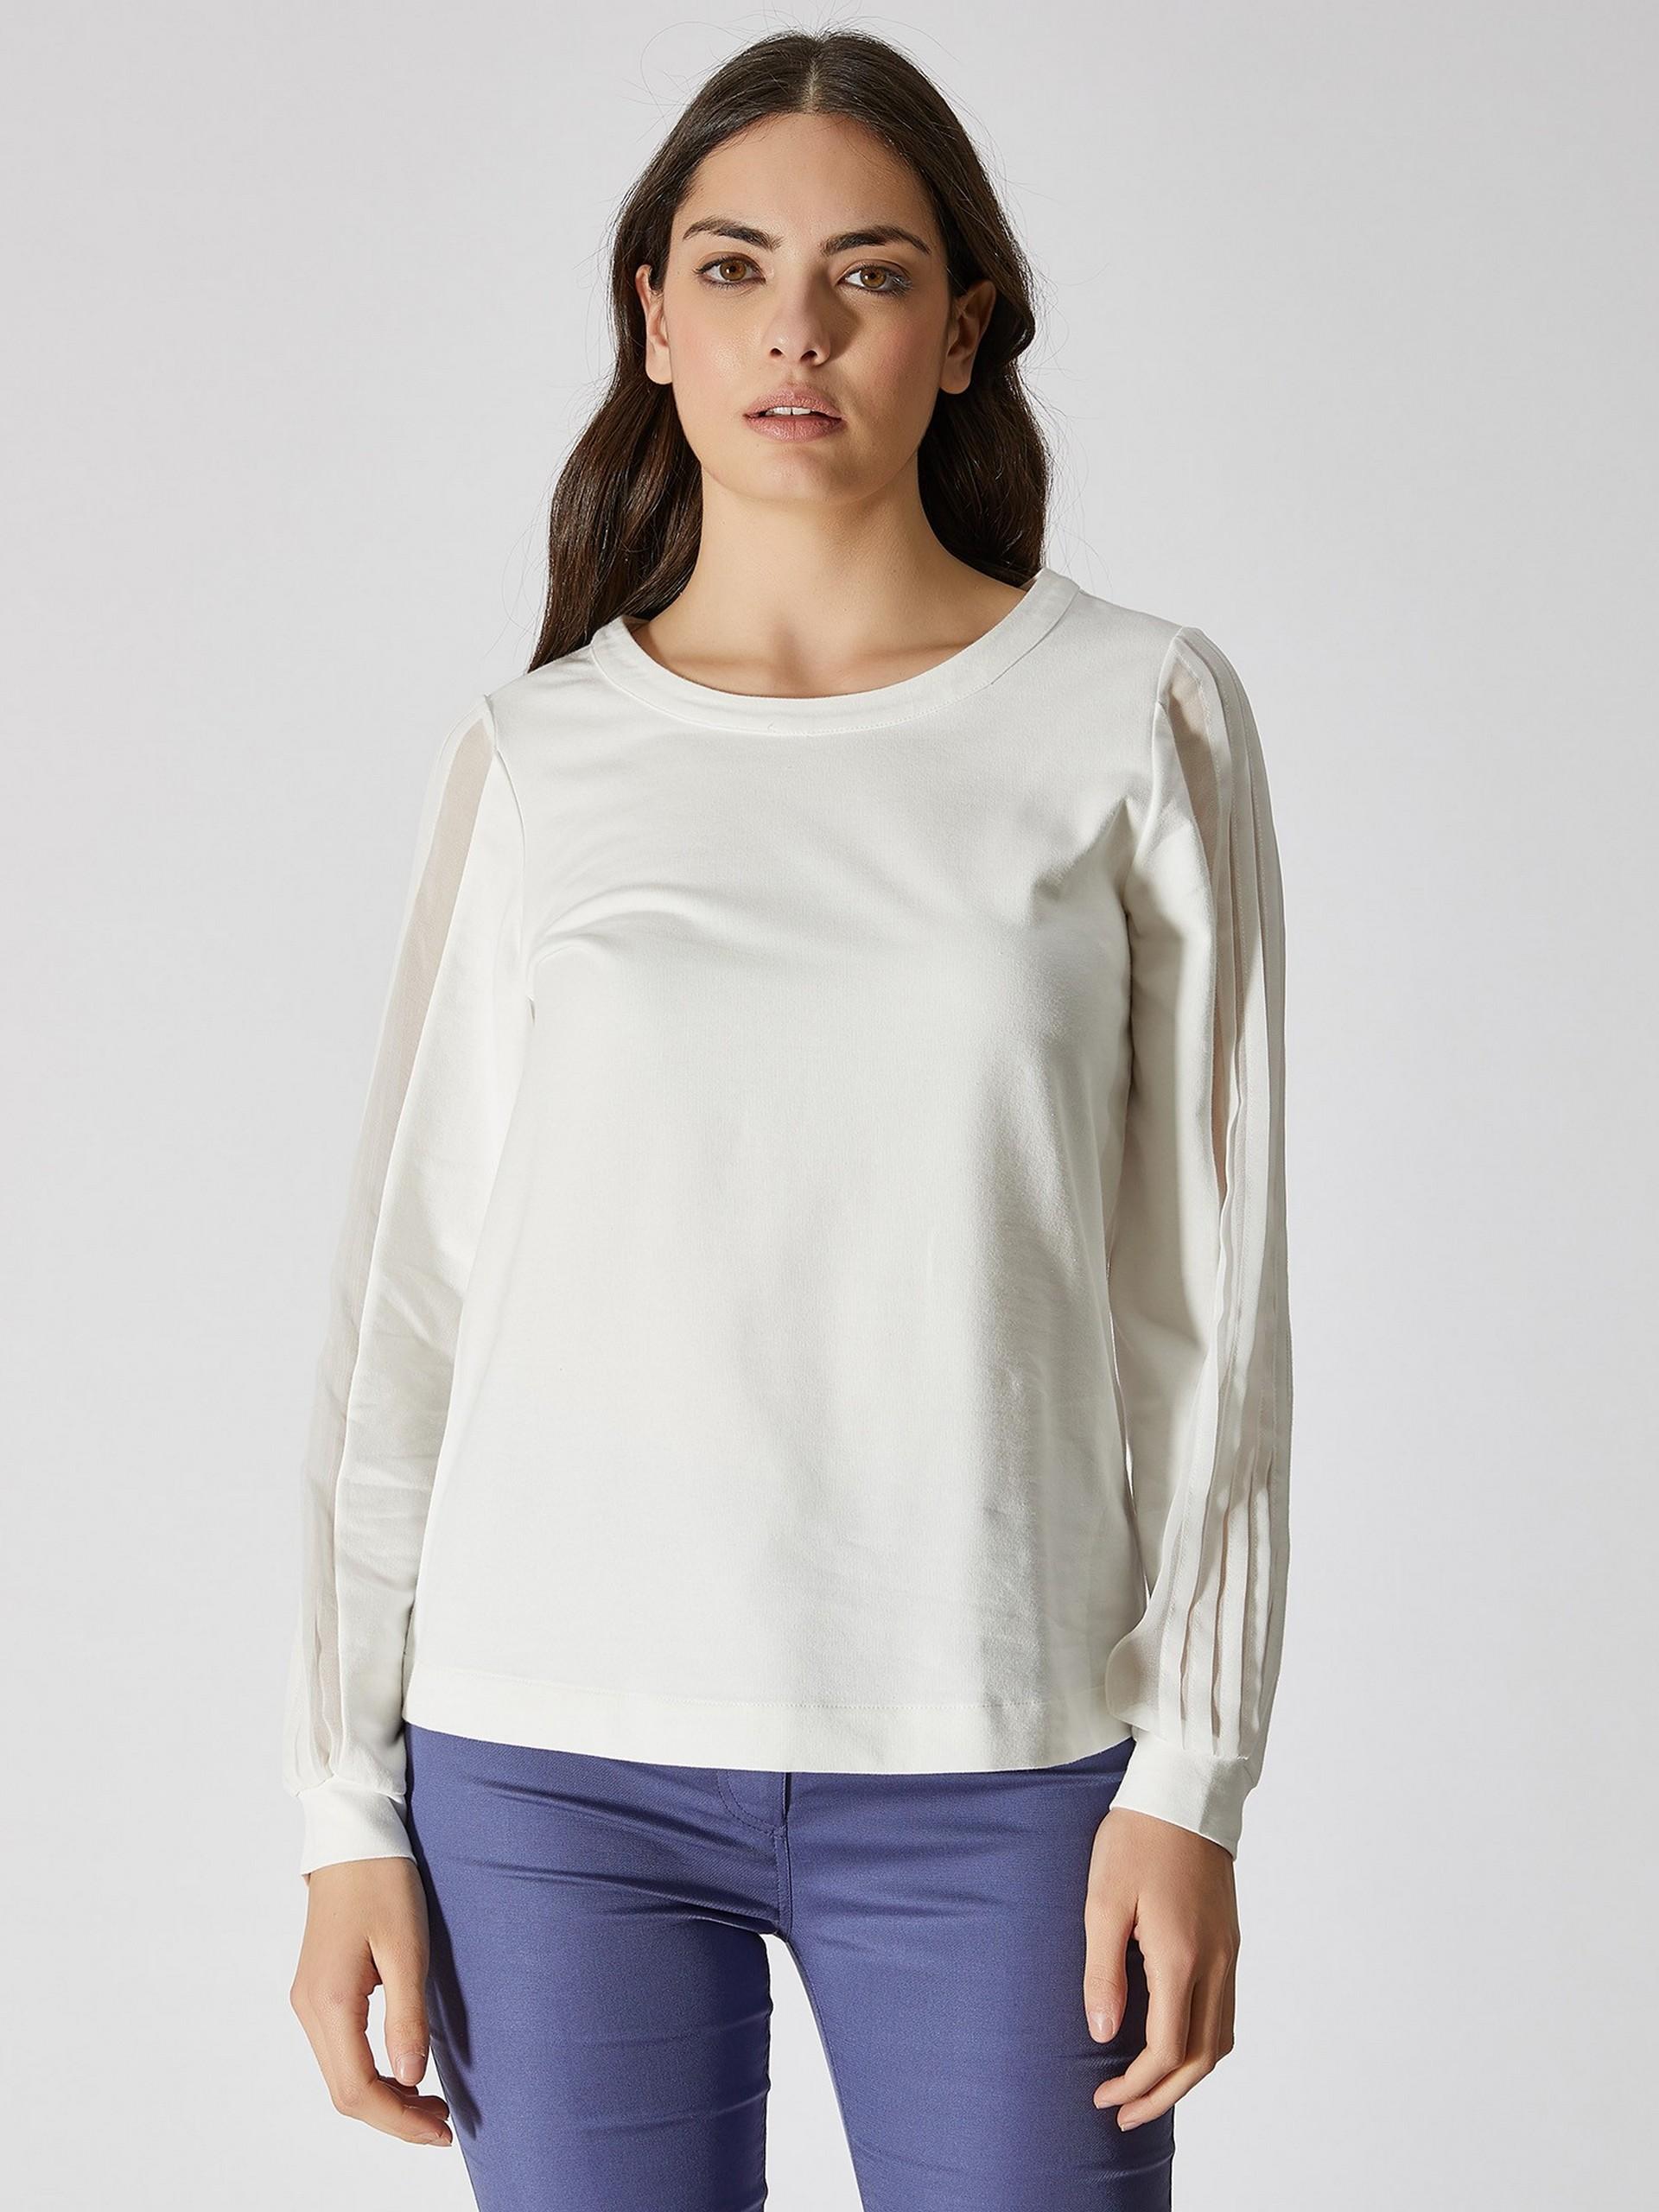 Chiffon Sleeve Detailed Sweatshirt